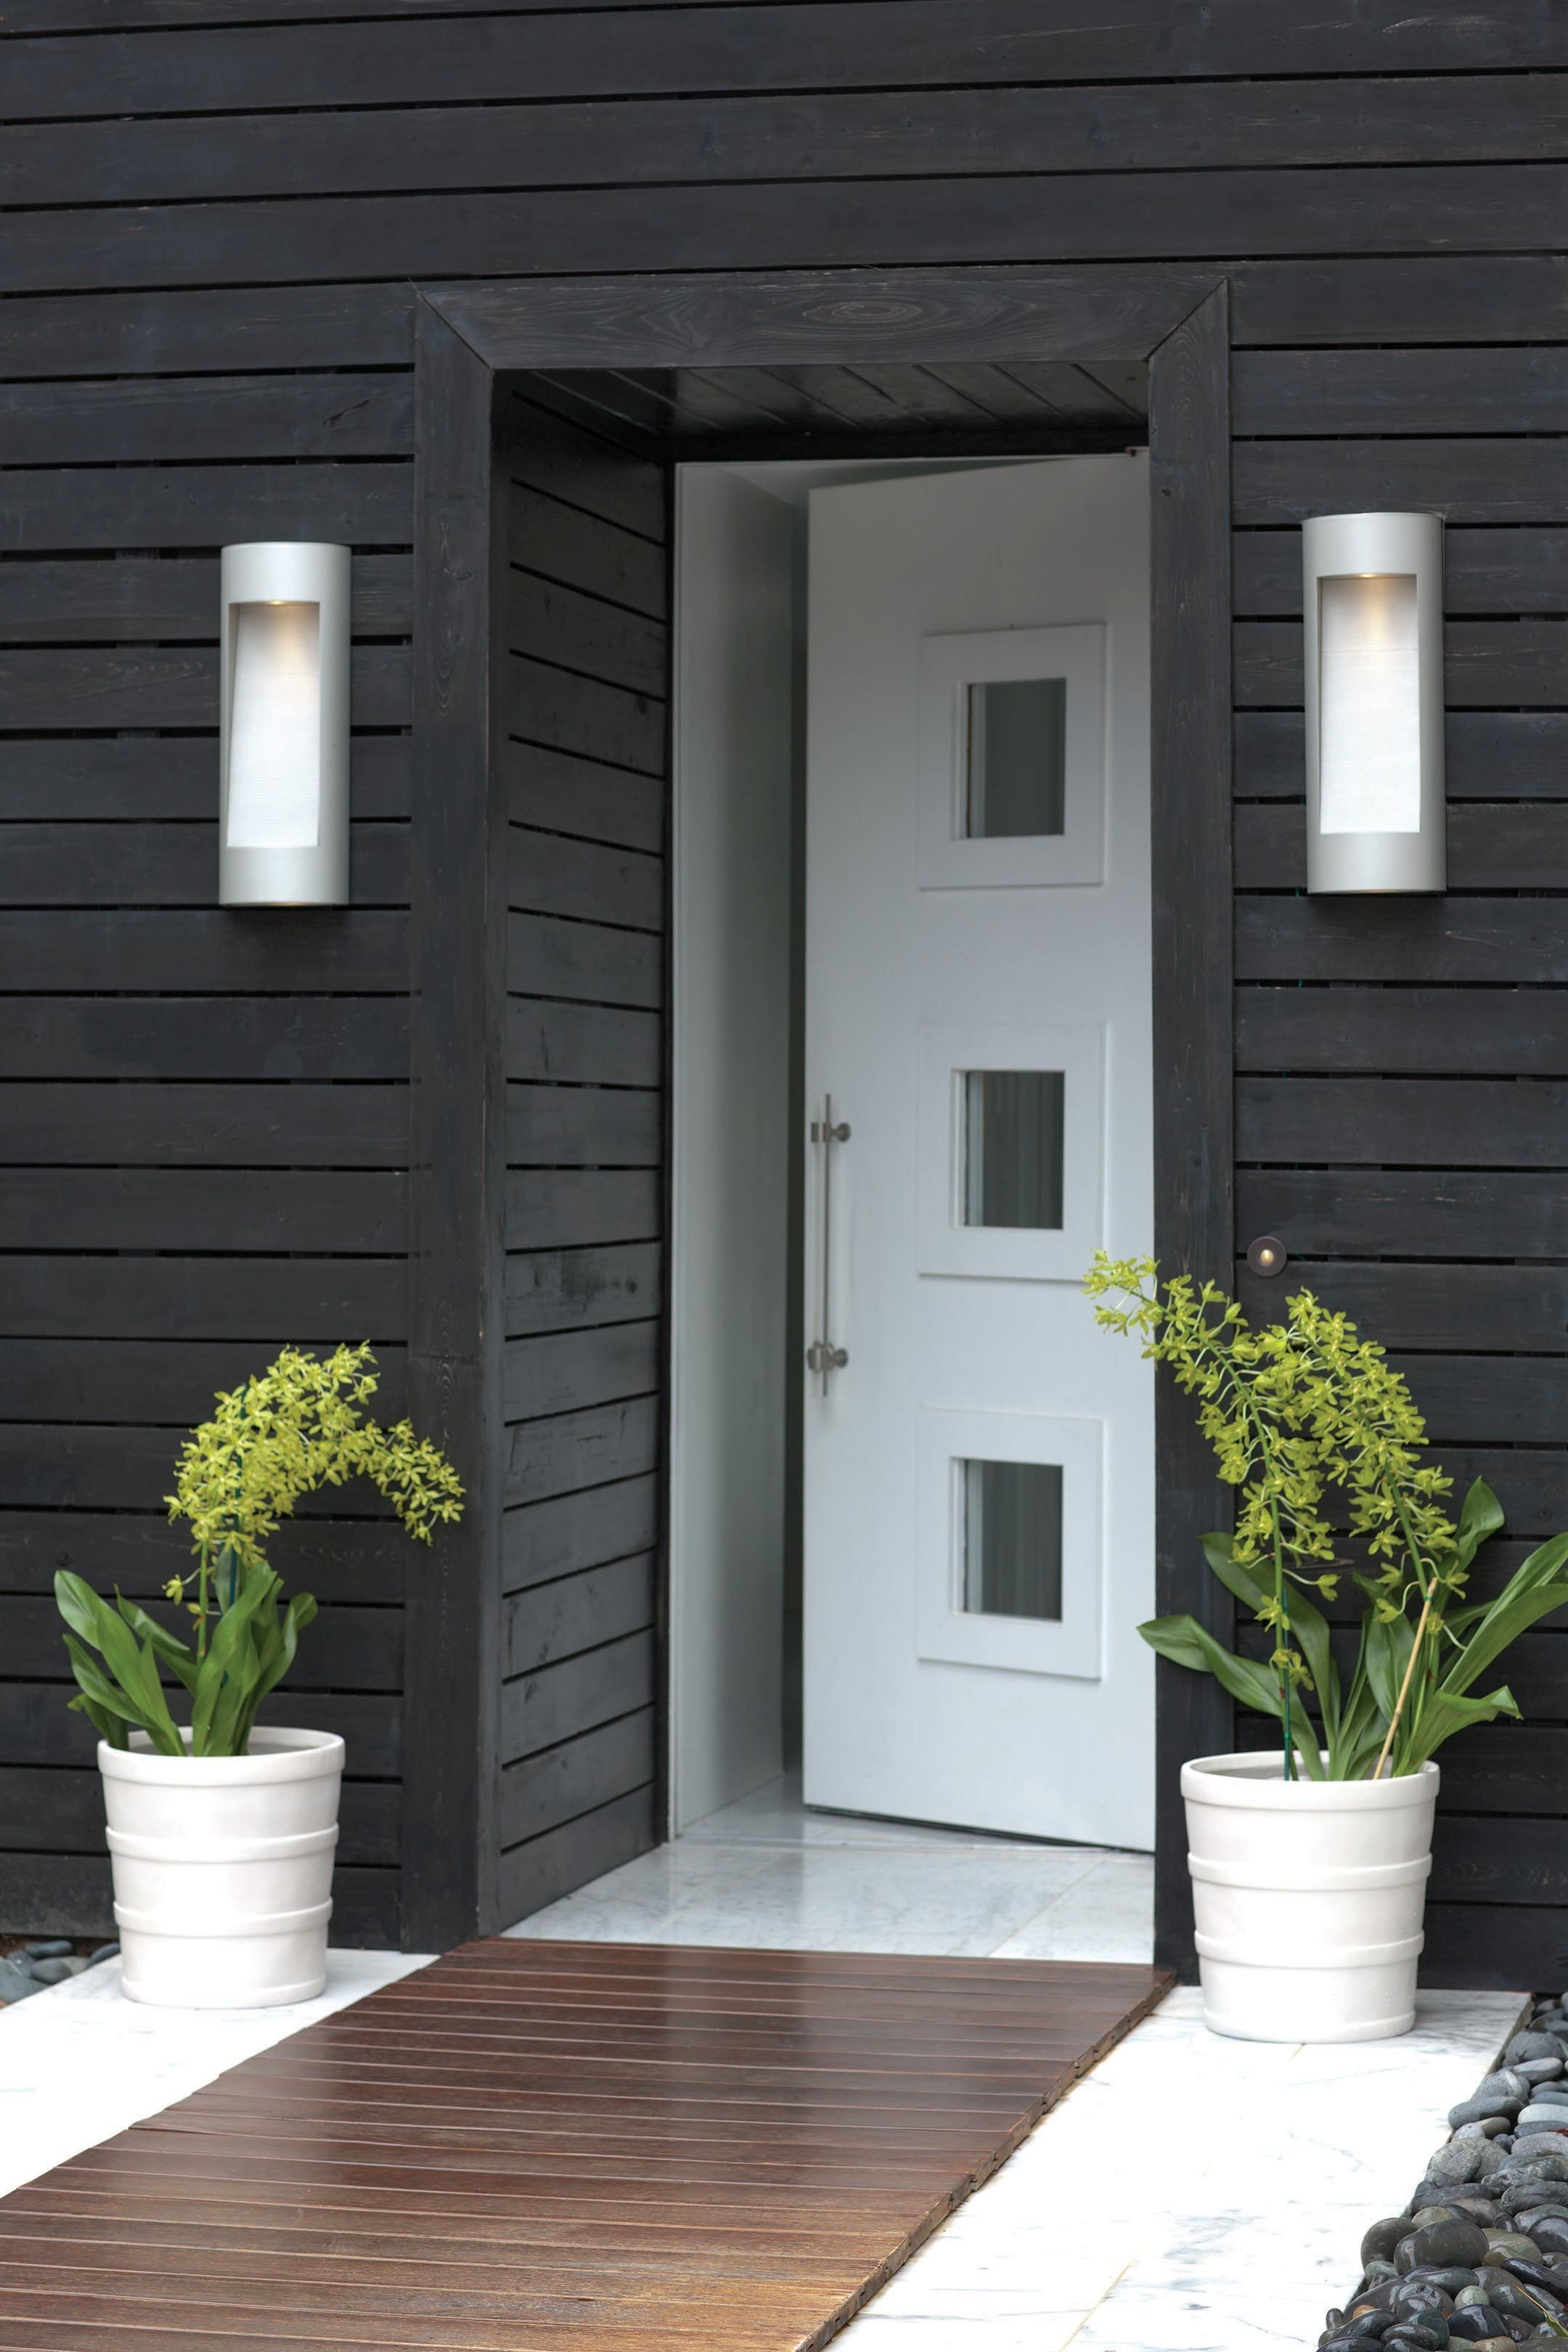 Hinkley Luna Outdoor Wall Lights House Exterior Modern Door Modern Entrance